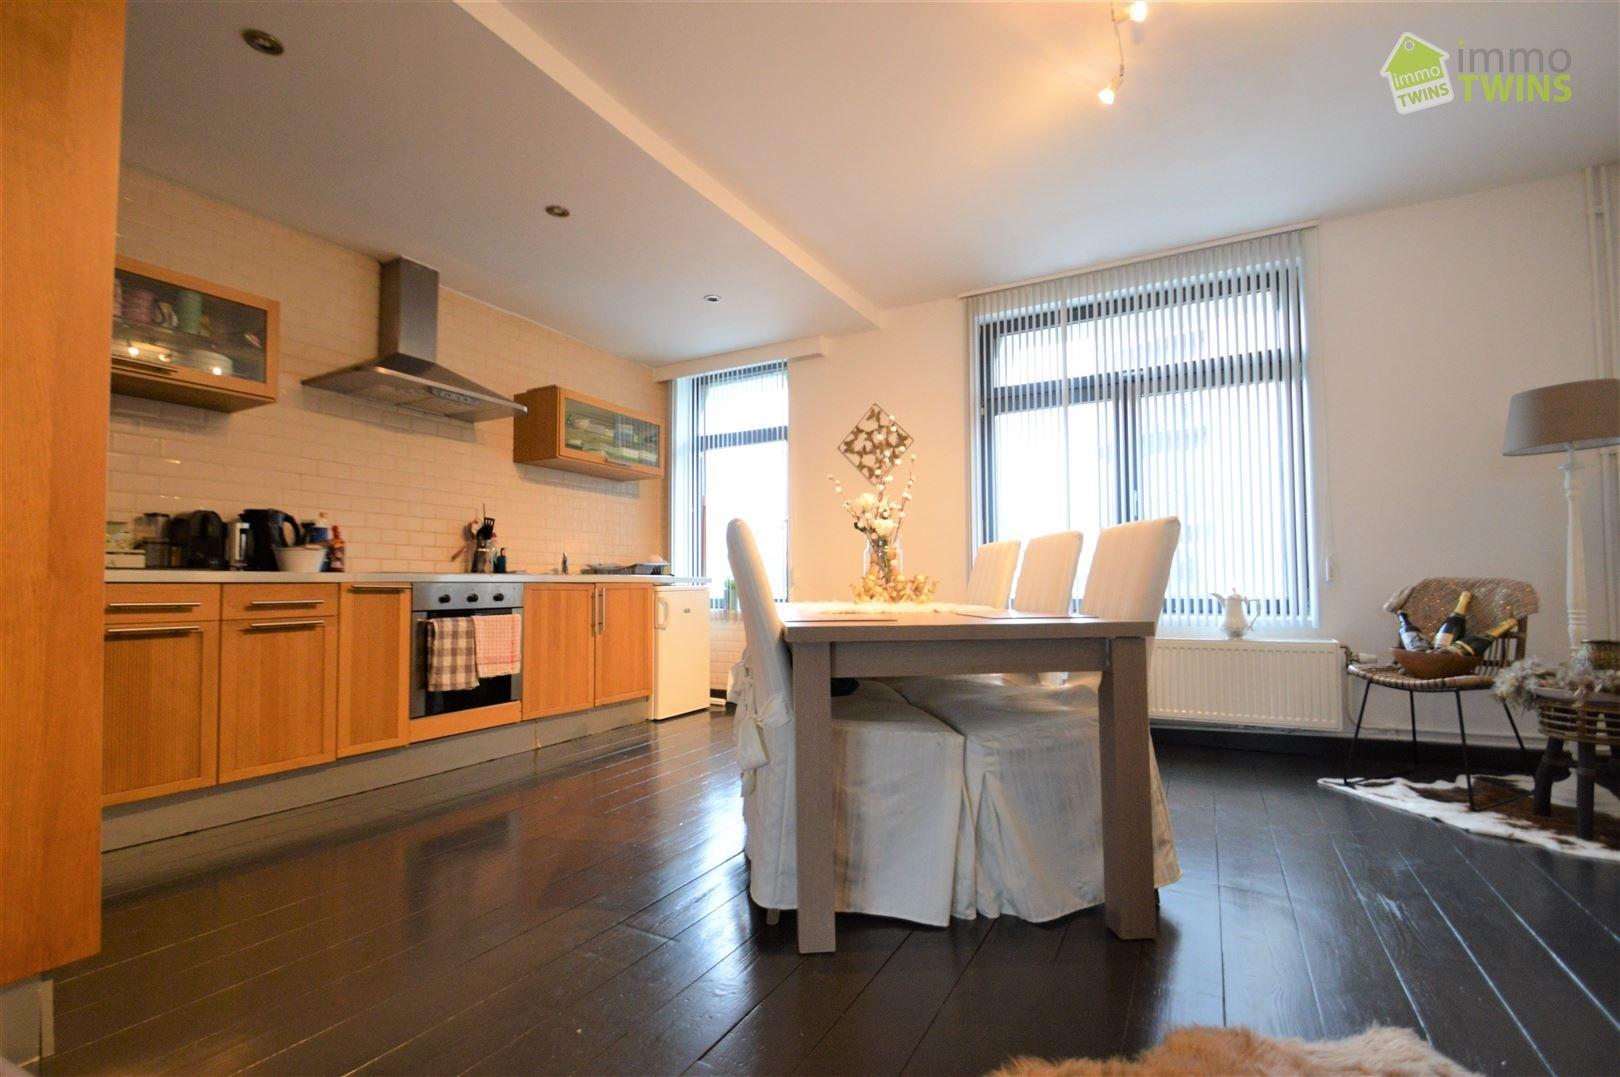 Foto 4 : Duplex/triplex te 9200 DENDERMONDE (België) - Prijs € 650